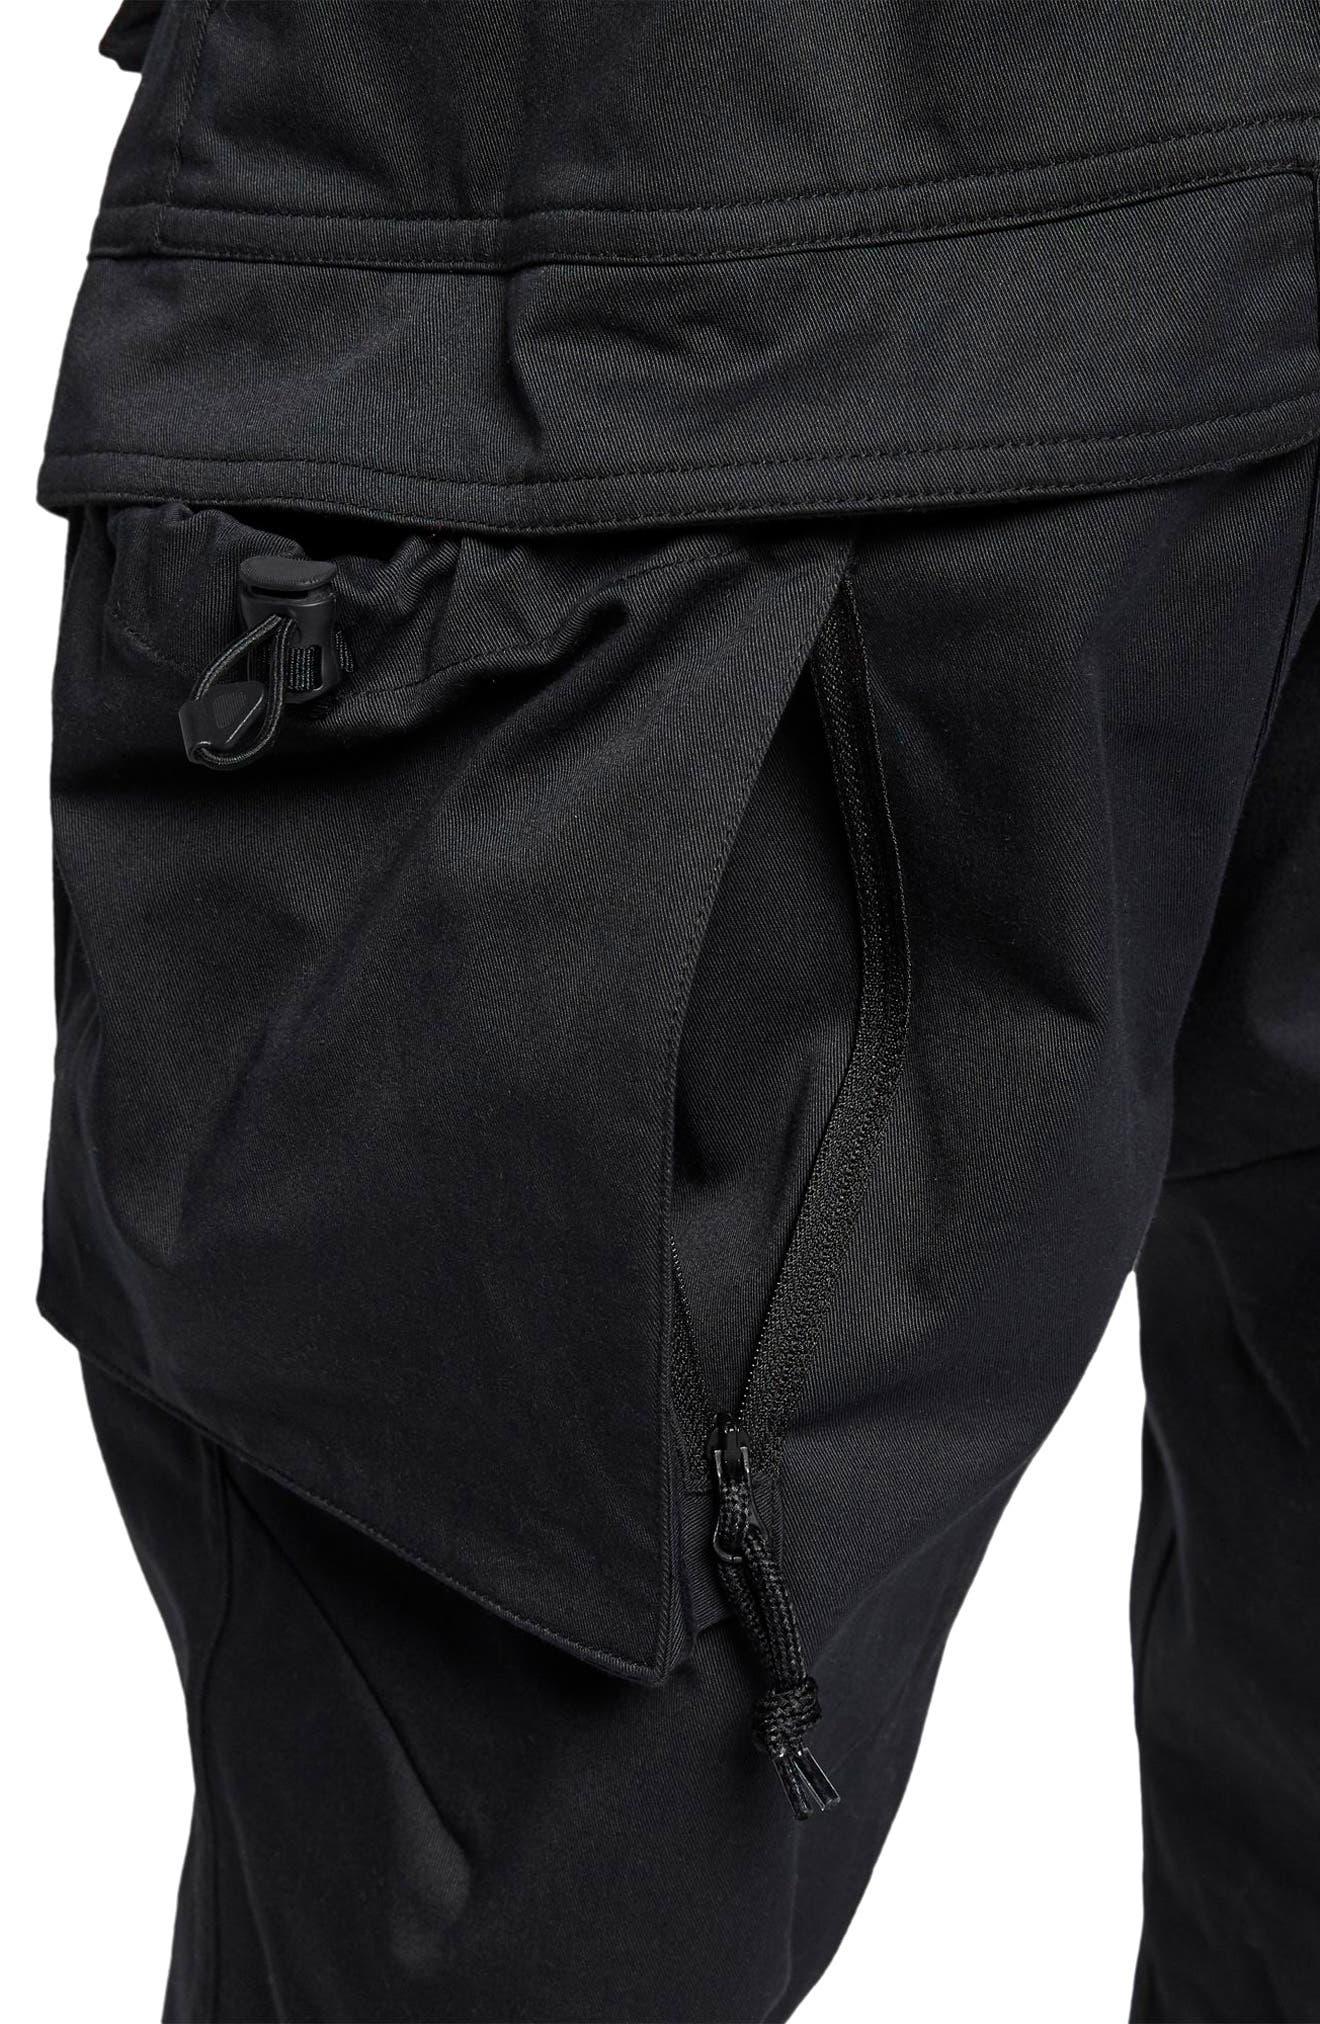 ACG Men's Cargo Pants,                             Alternate thumbnail 4, color,                             BLACK